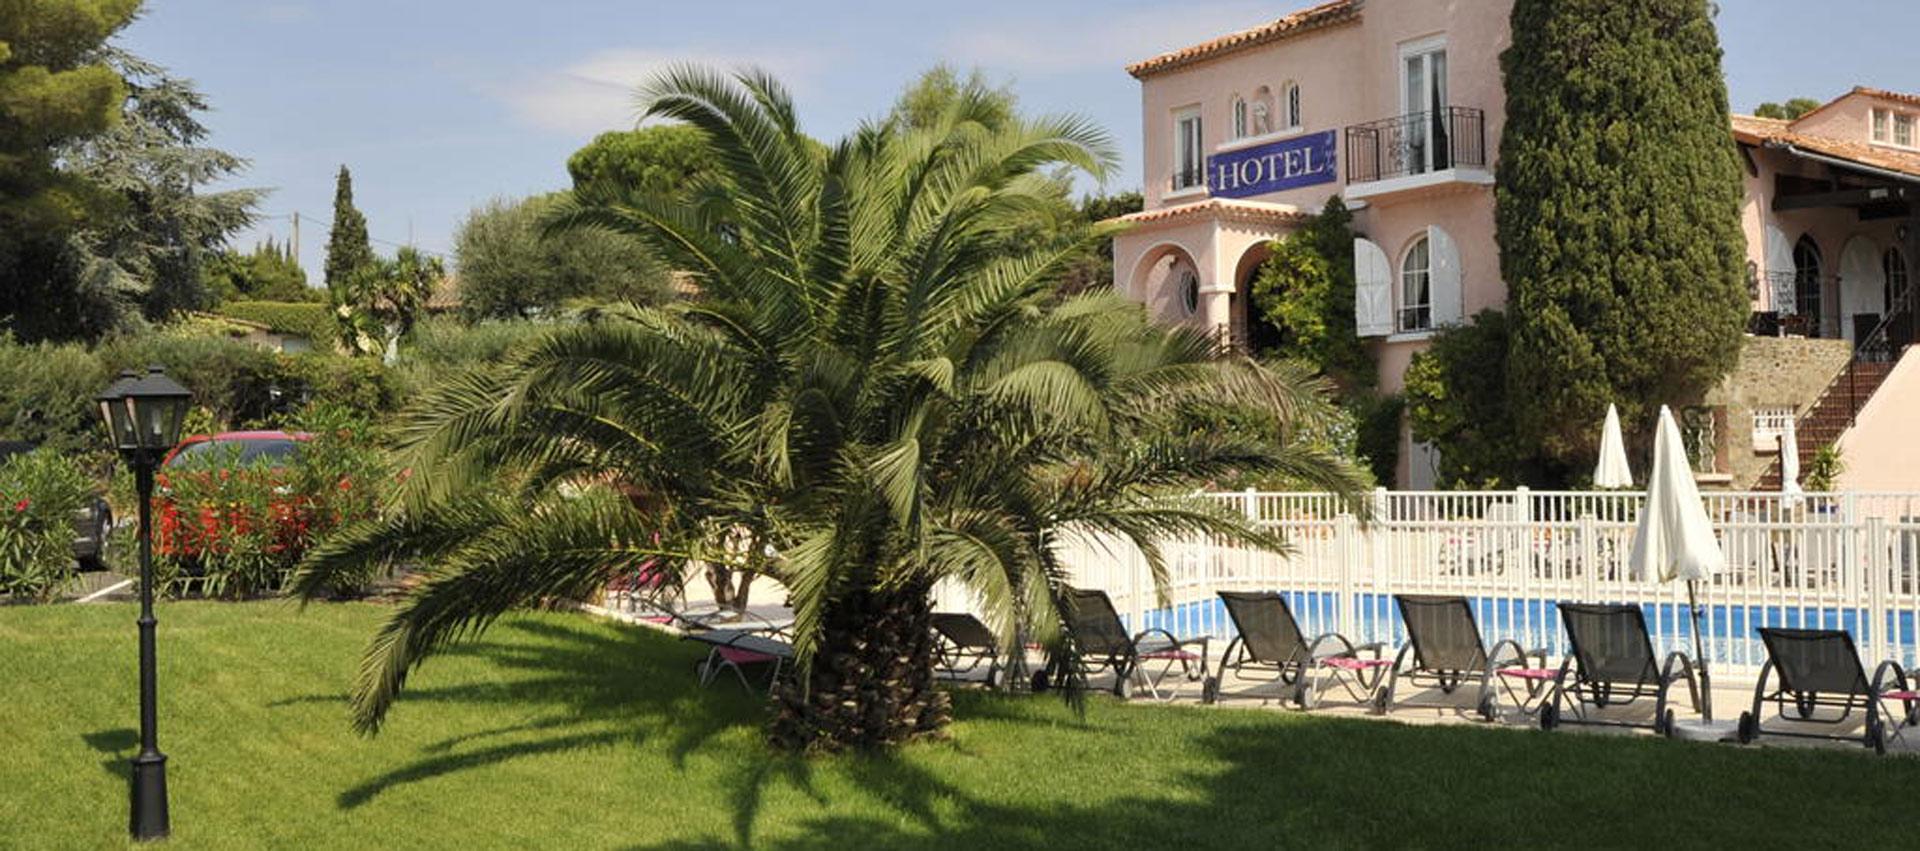 Hotel Villa des Anges 2